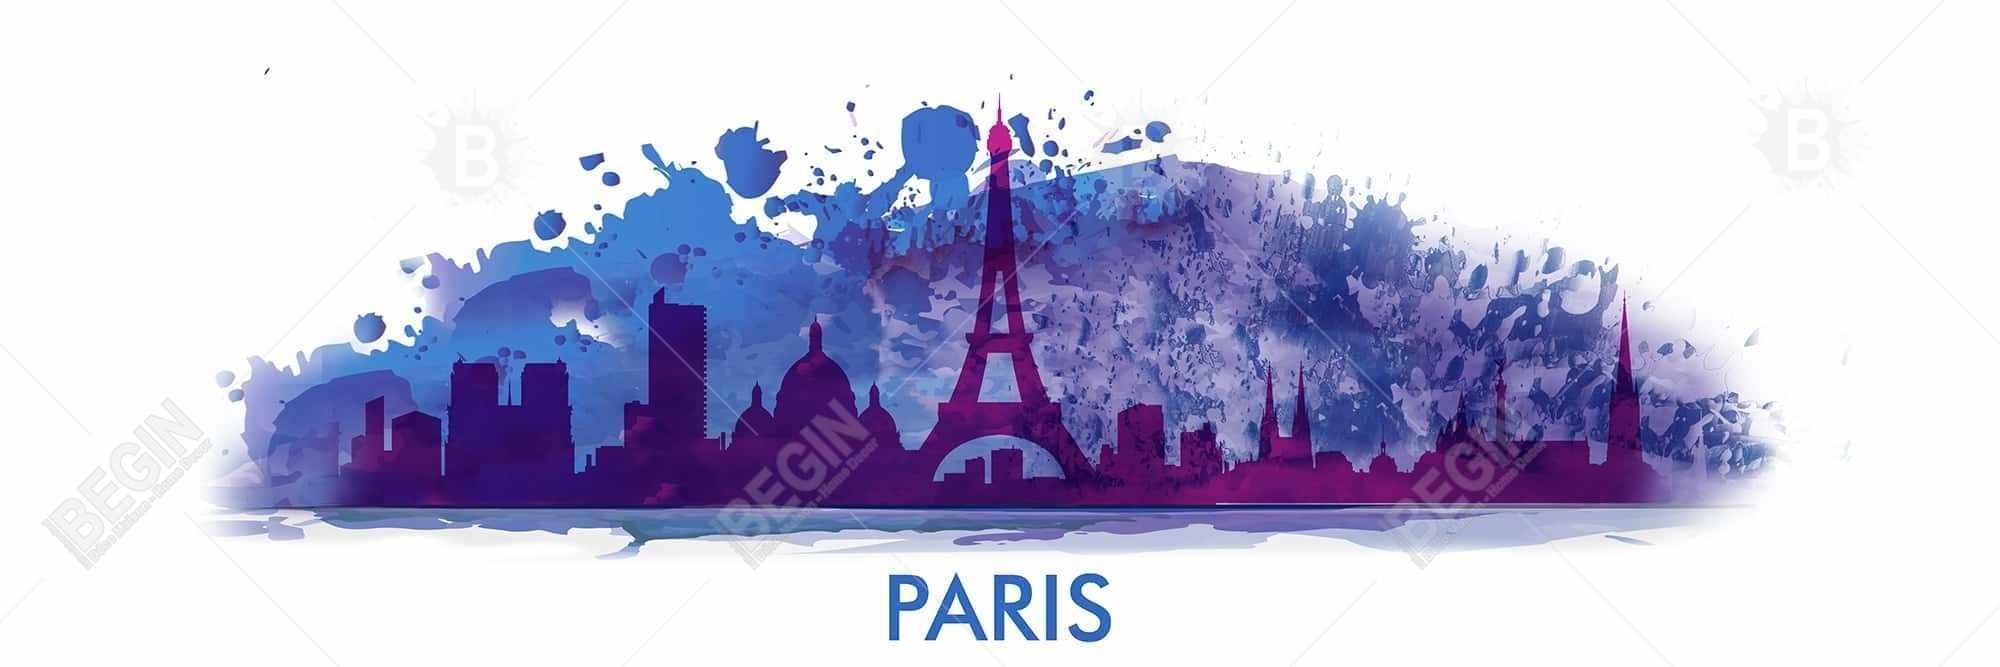 Paint splash silhouette of paris